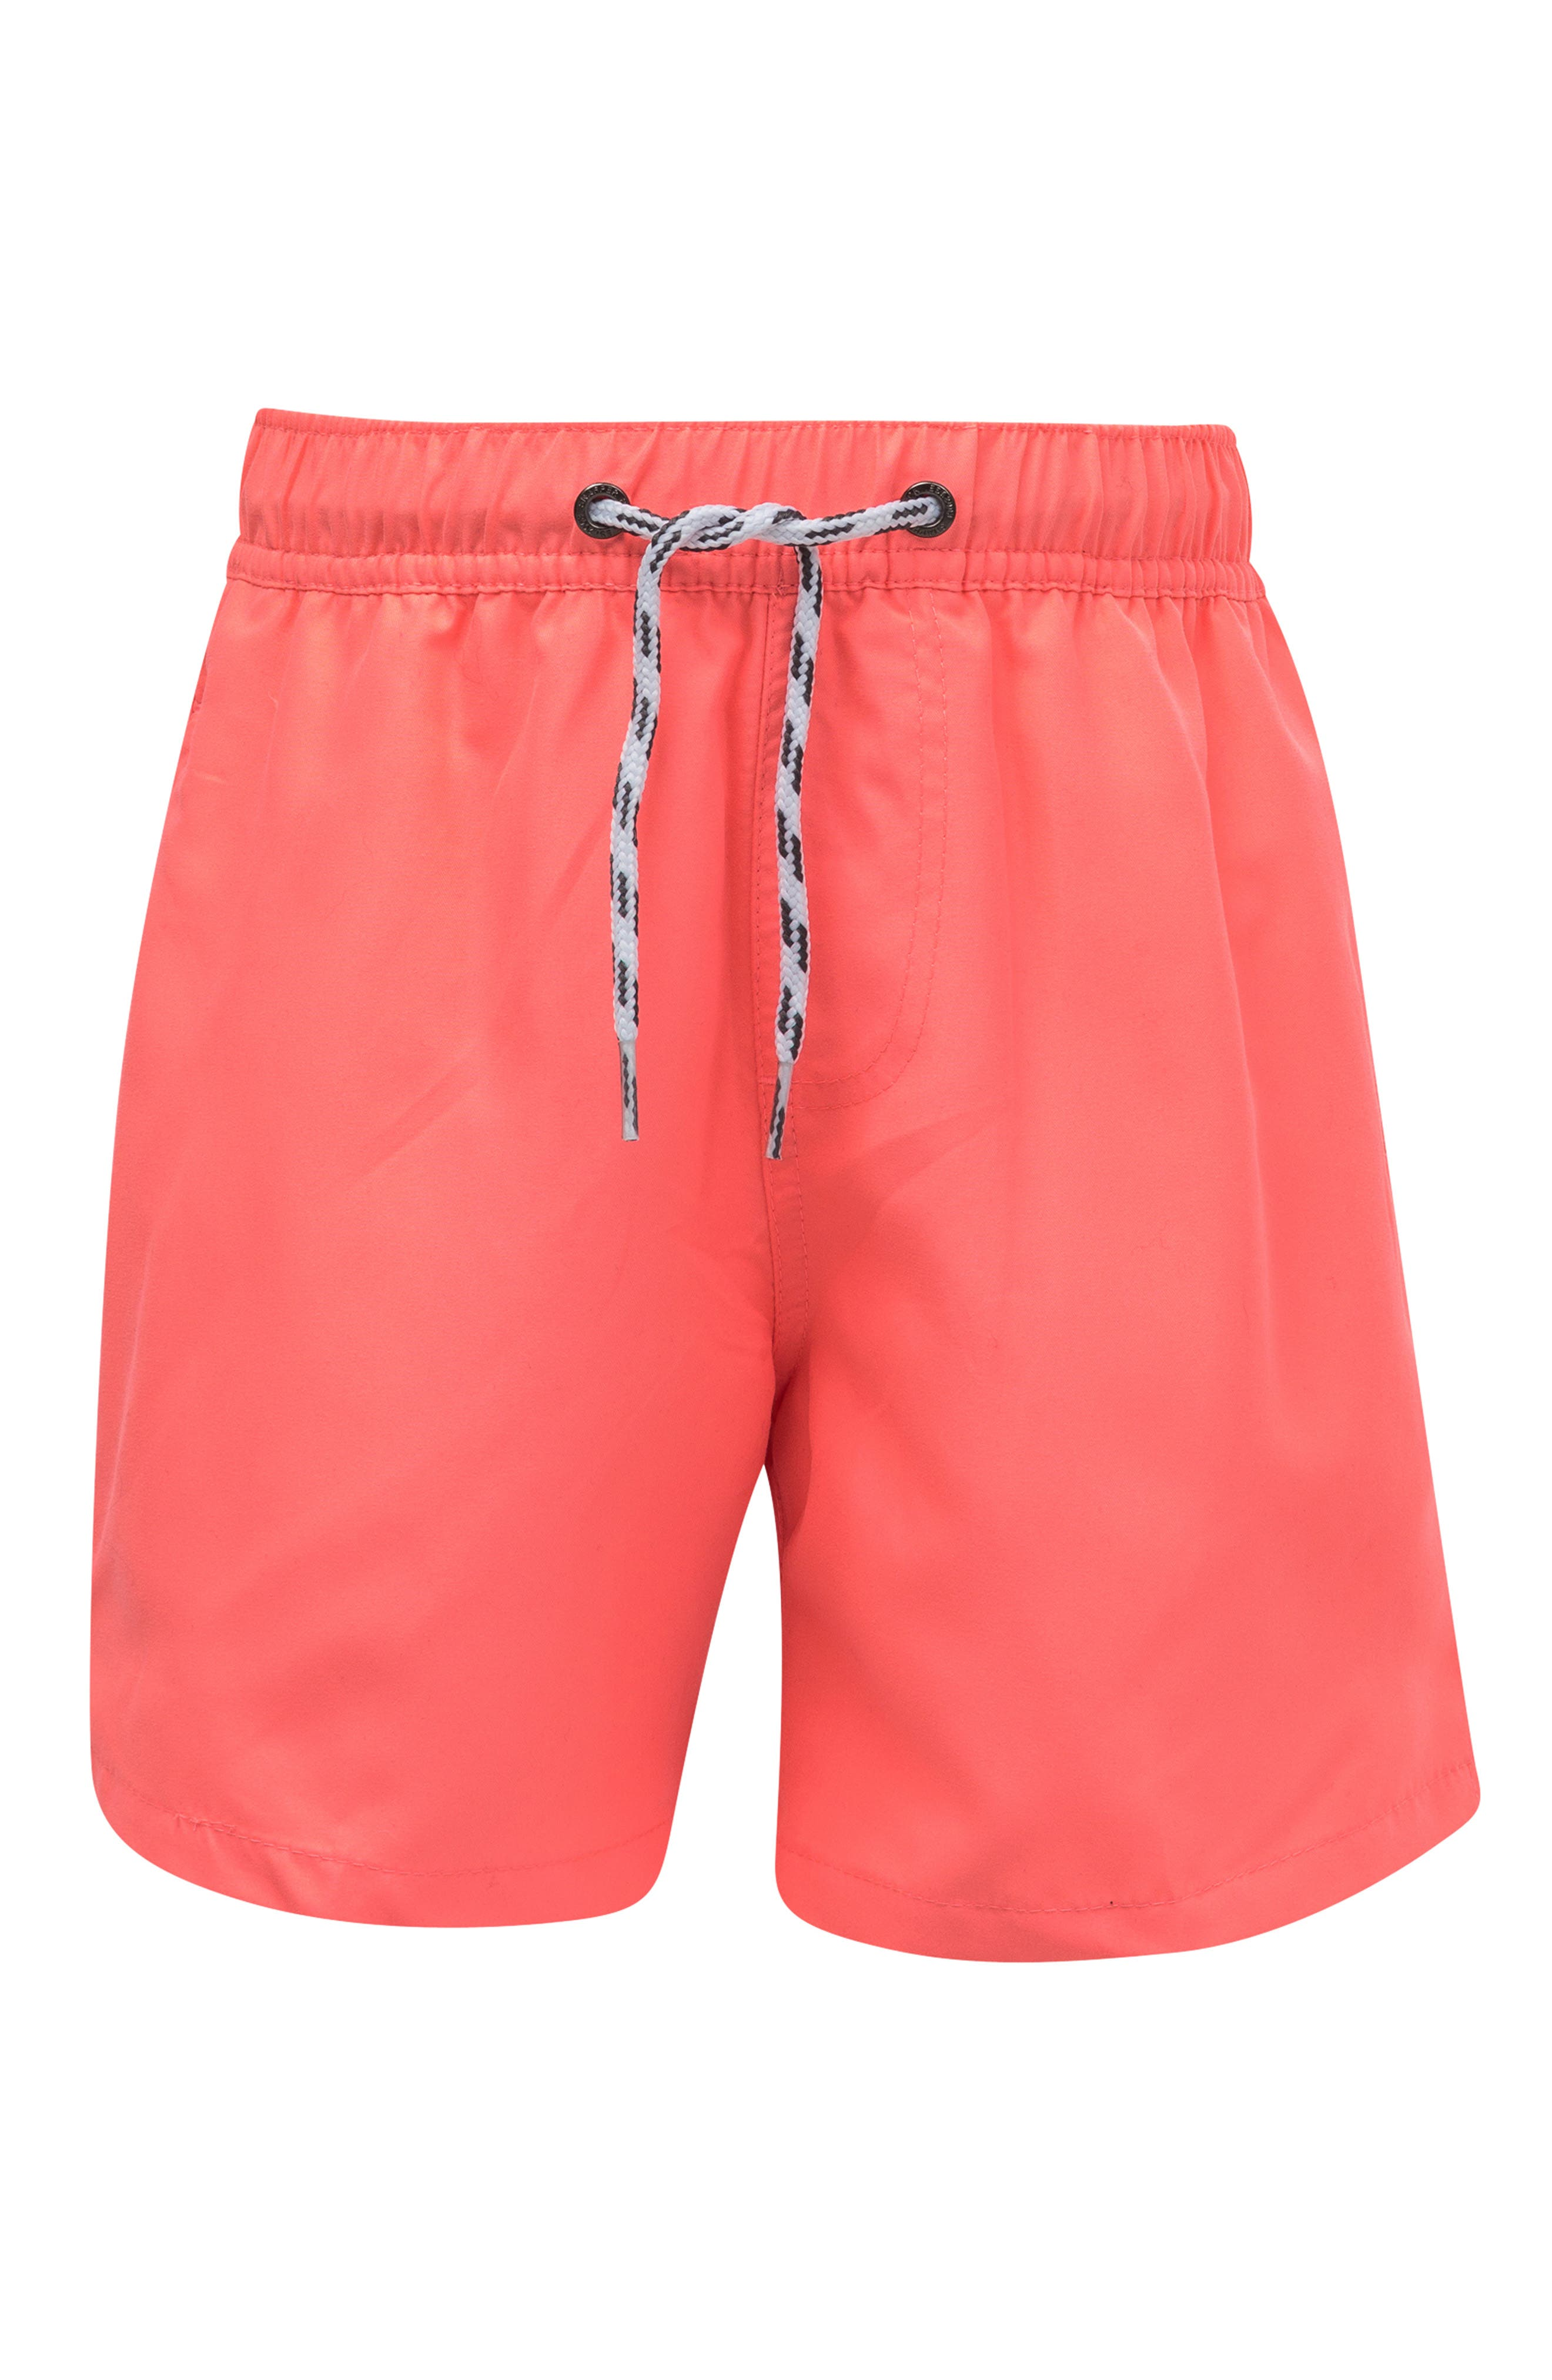 Neon Coral Hybrid Board Shorts,                             Main thumbnail 1, color,                             BRIGHT ORANGE